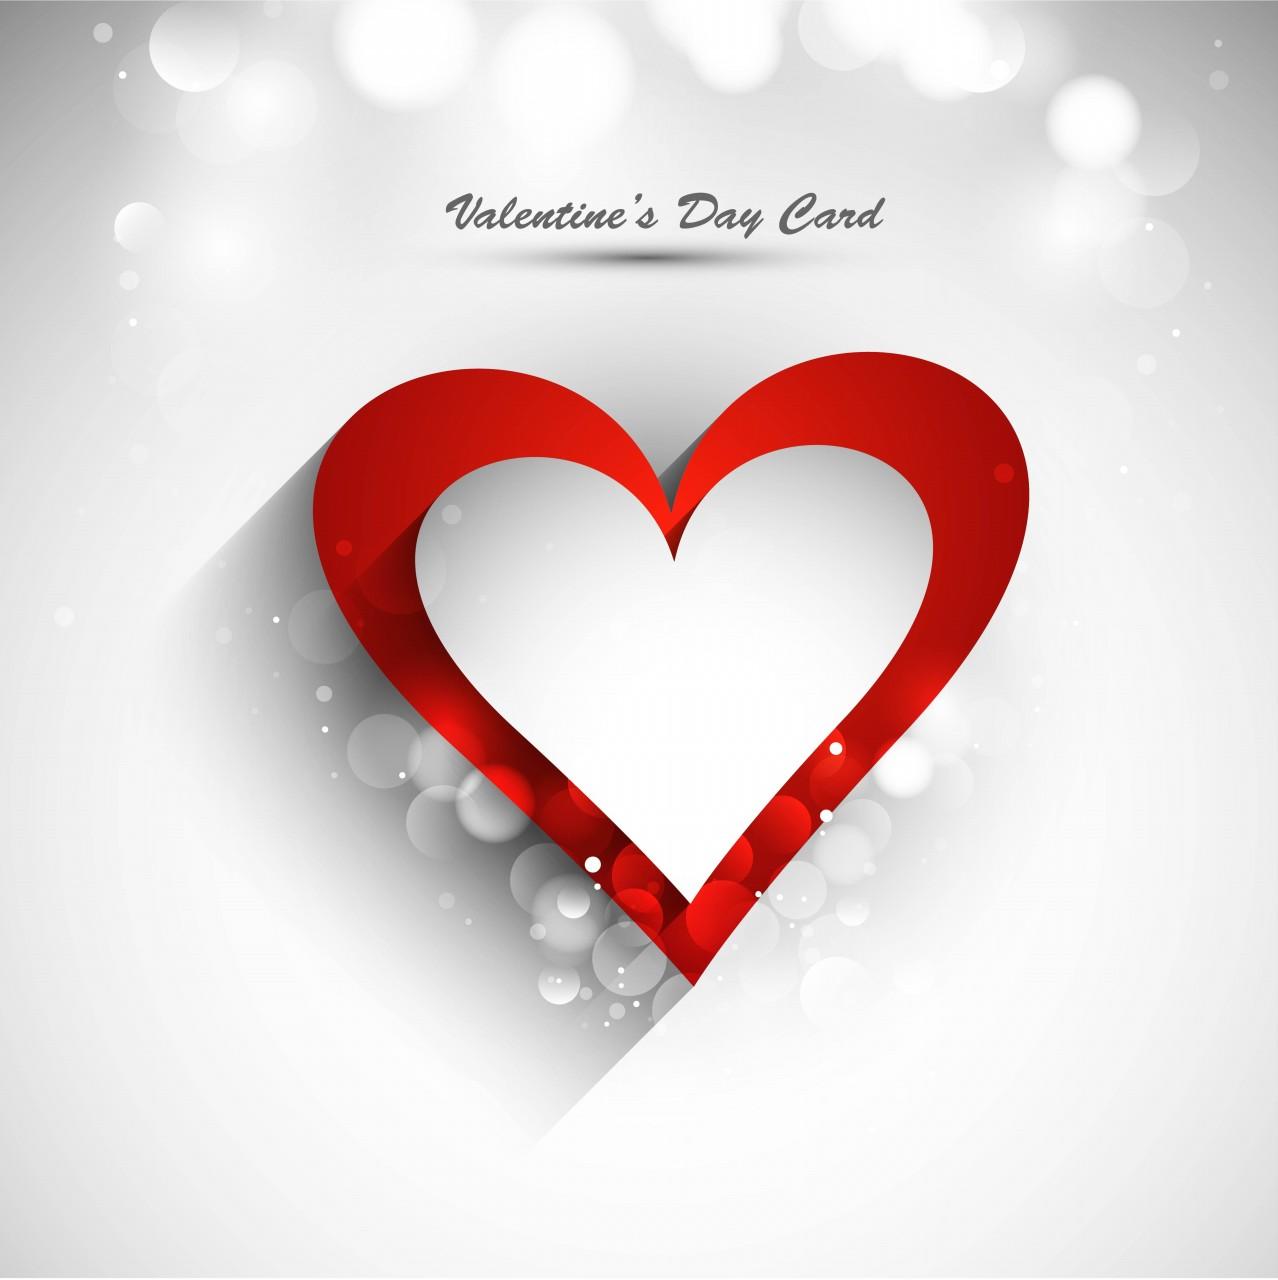 Free Romantic Cards 2014 Free Romantic eCards – Free Online Valentines Day Card